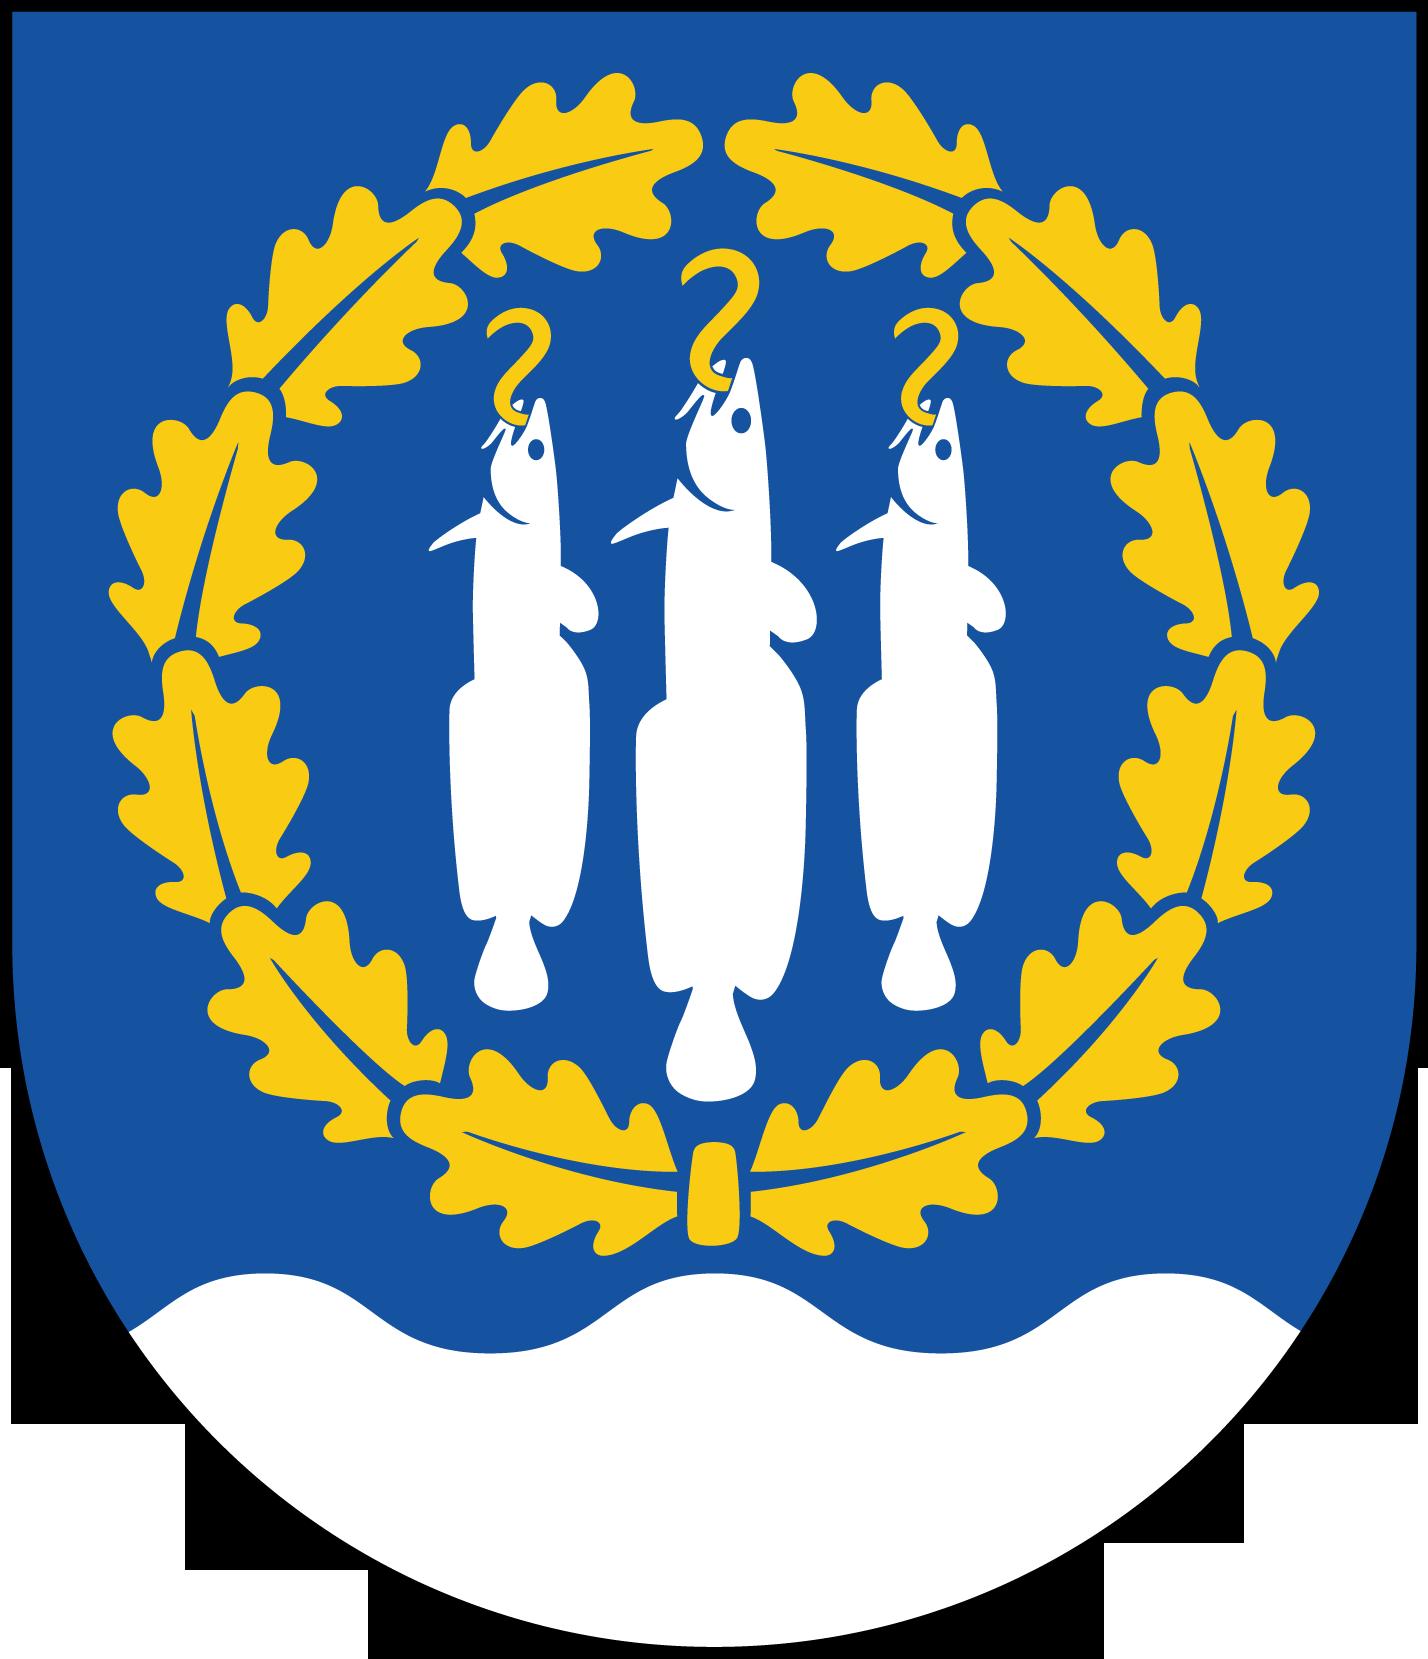 Orust kommun logo